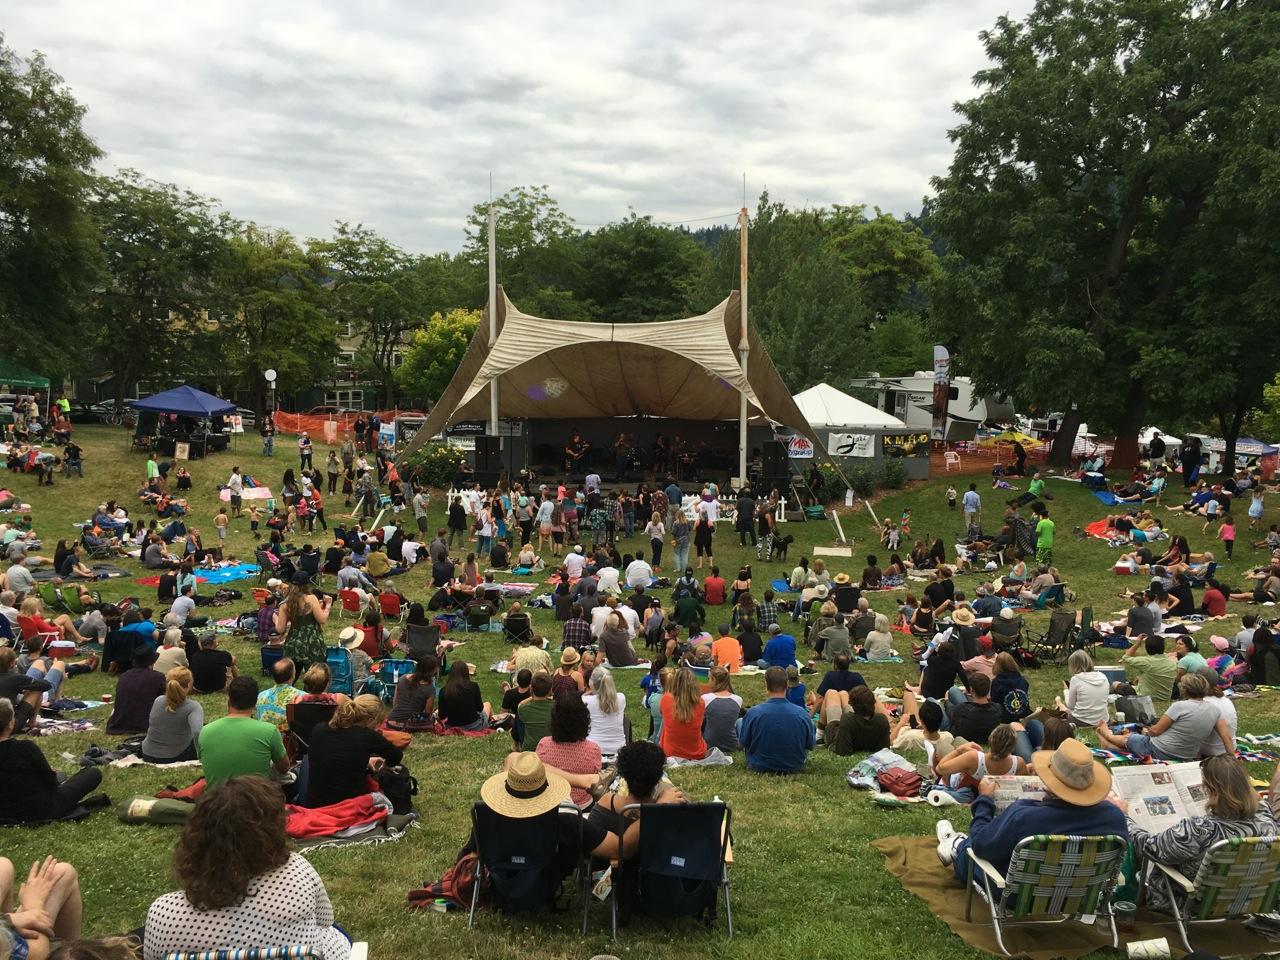 Cathedral Park Jazz Festival 2020.Cathedral Park Jazz Festival 2020 Festival 2020